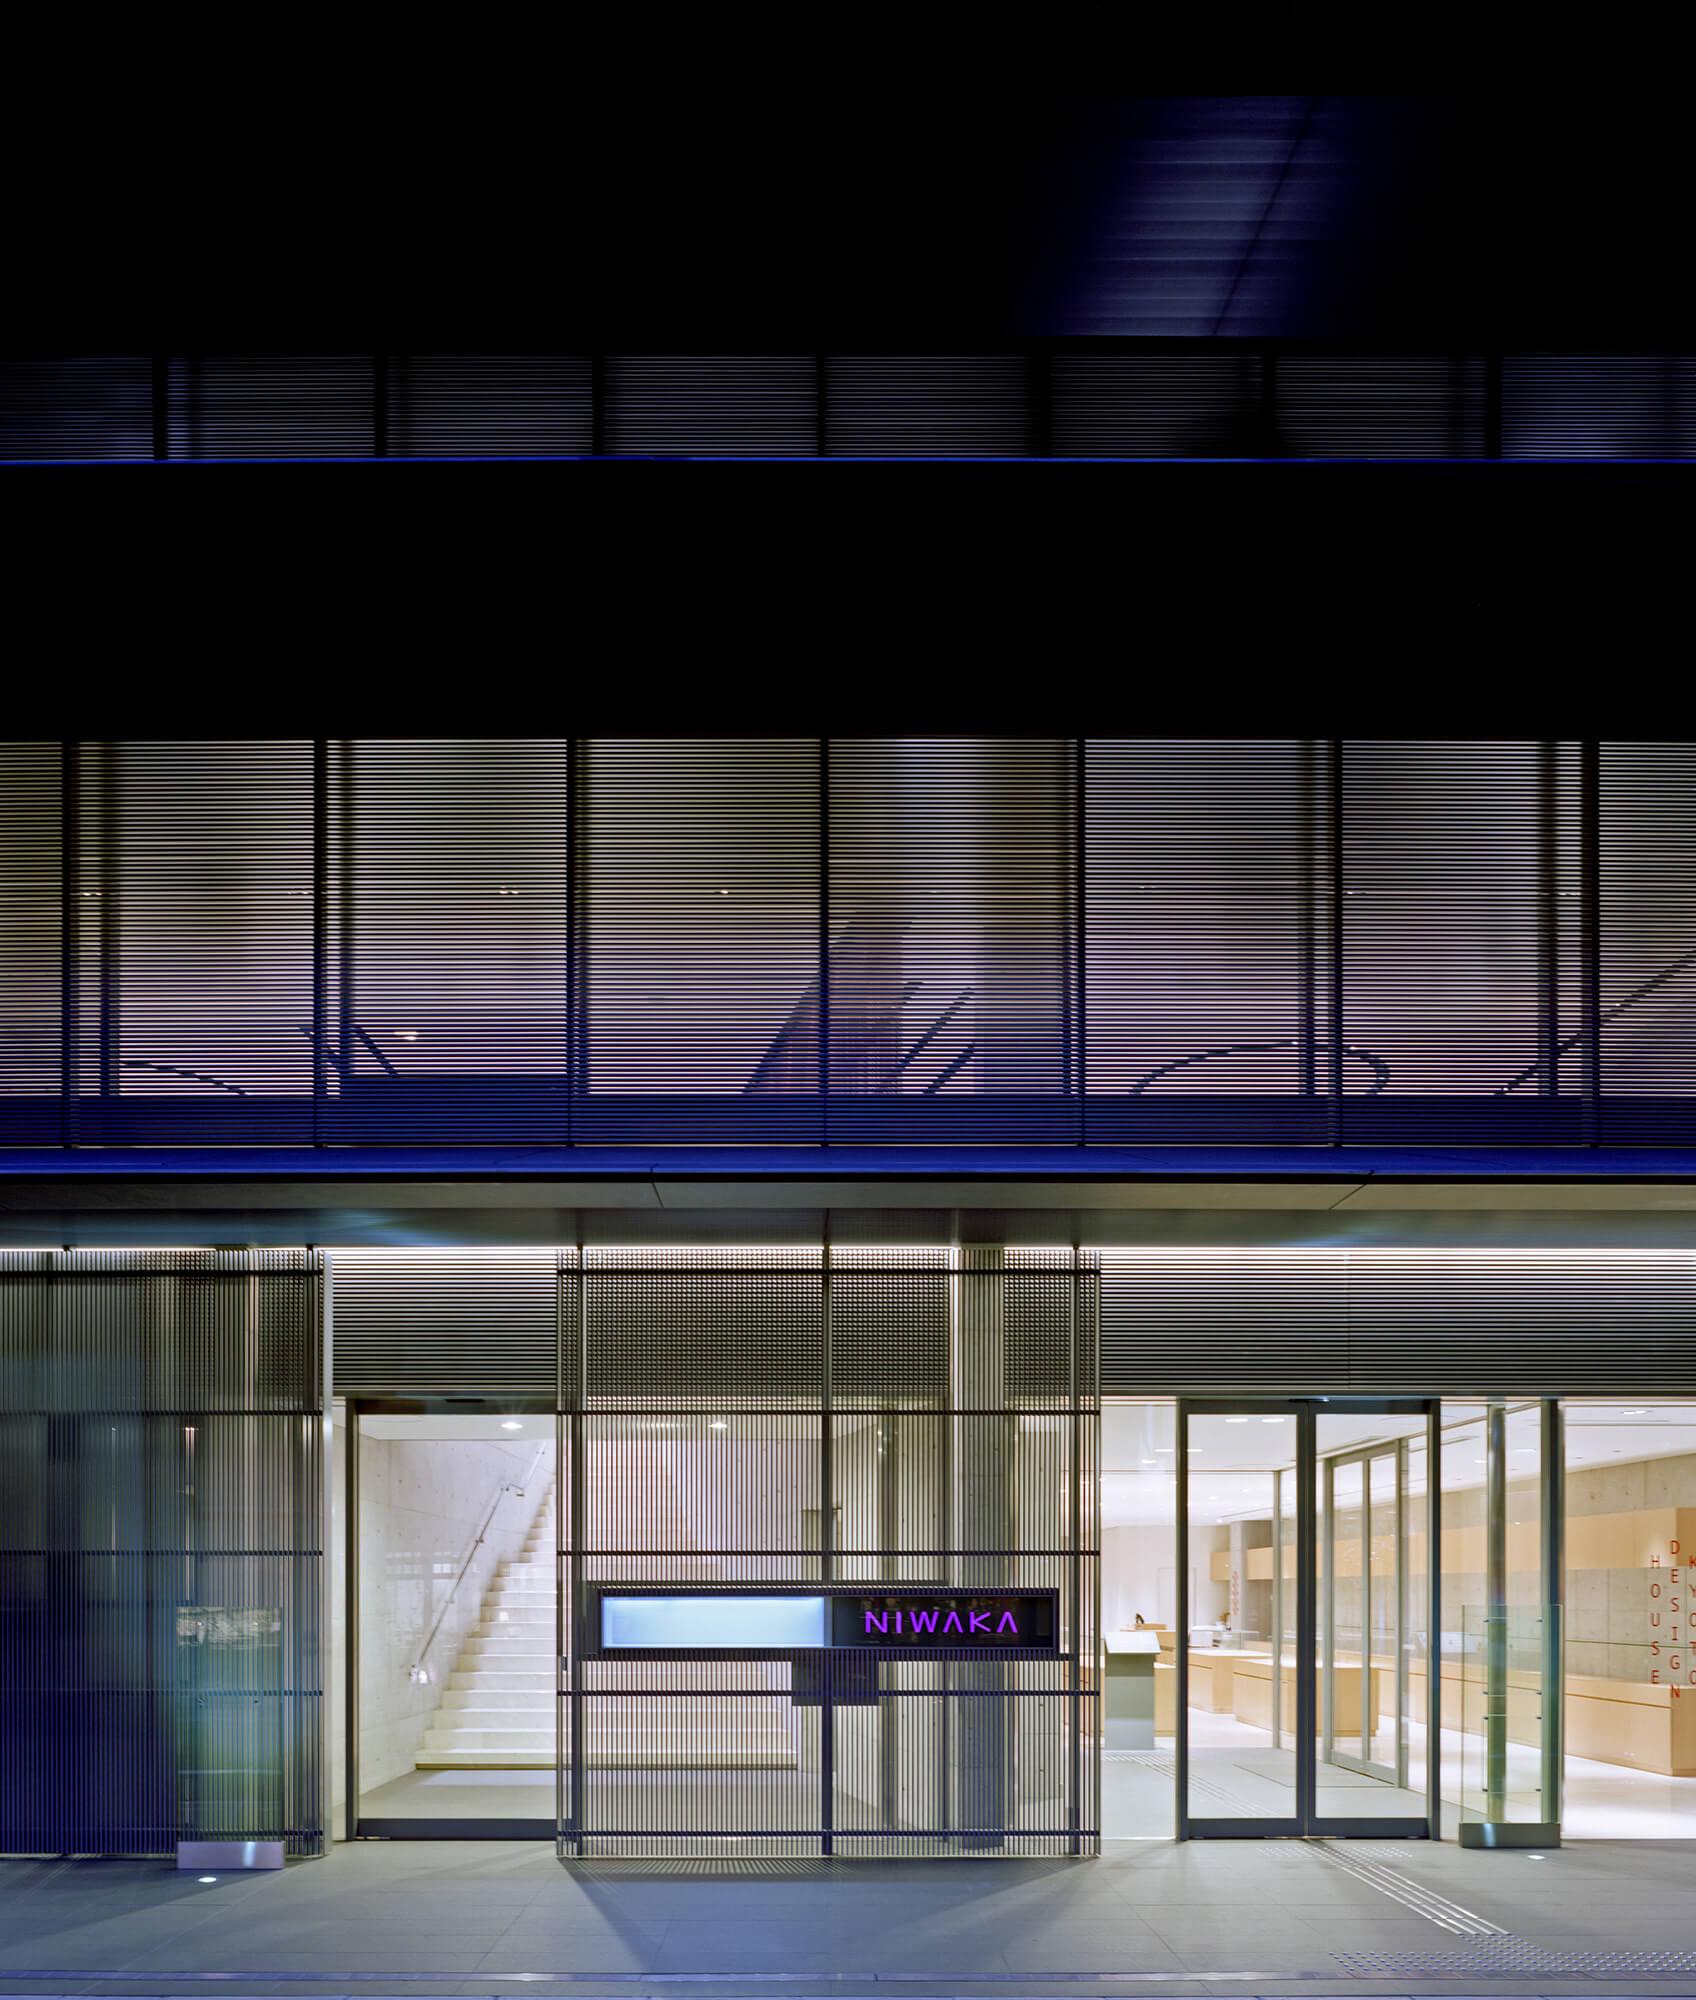 『NIWAKA KYOTO FLAGSHIP STORE 俄 京都本店』-京都府京都市-建築写真・竣工写真・インテリア写真4